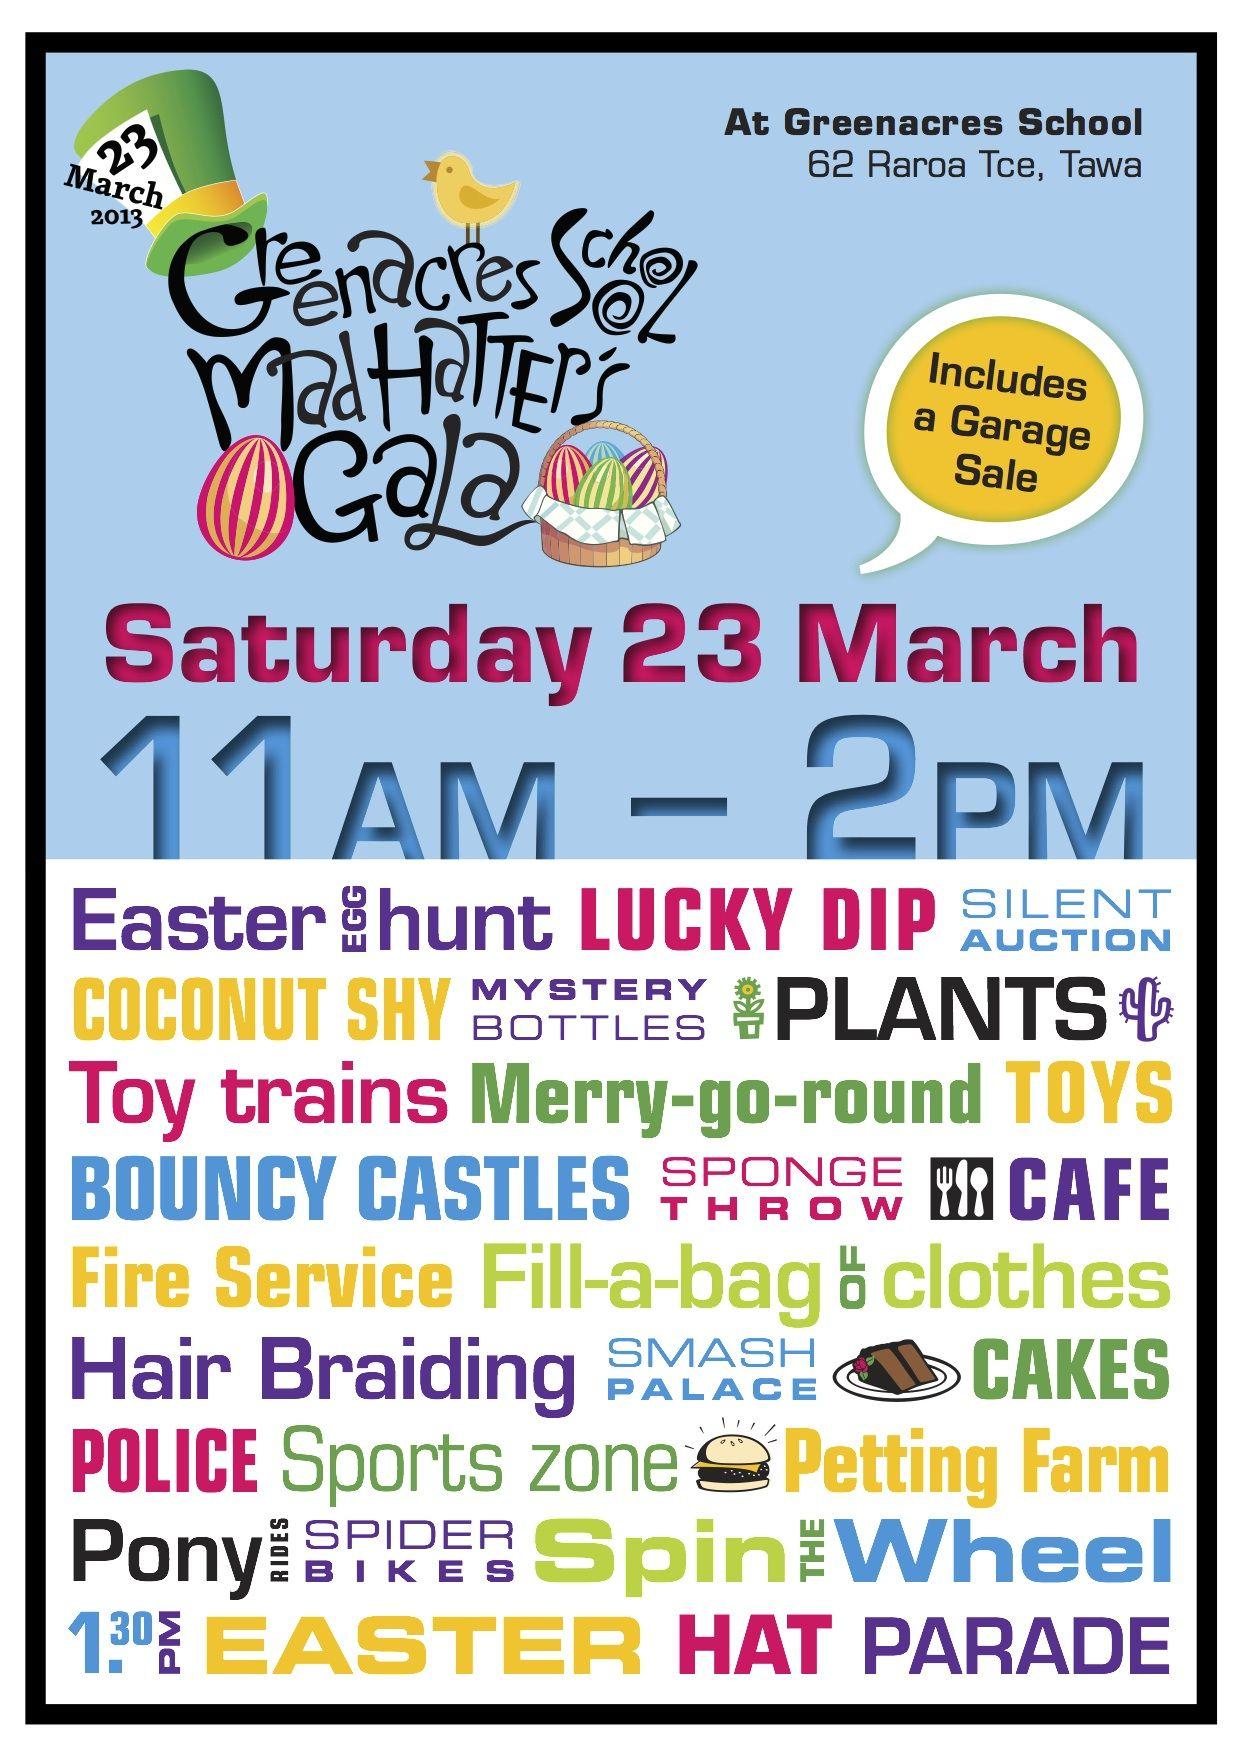 Greenacres School Mad Hatter's Easter Gala